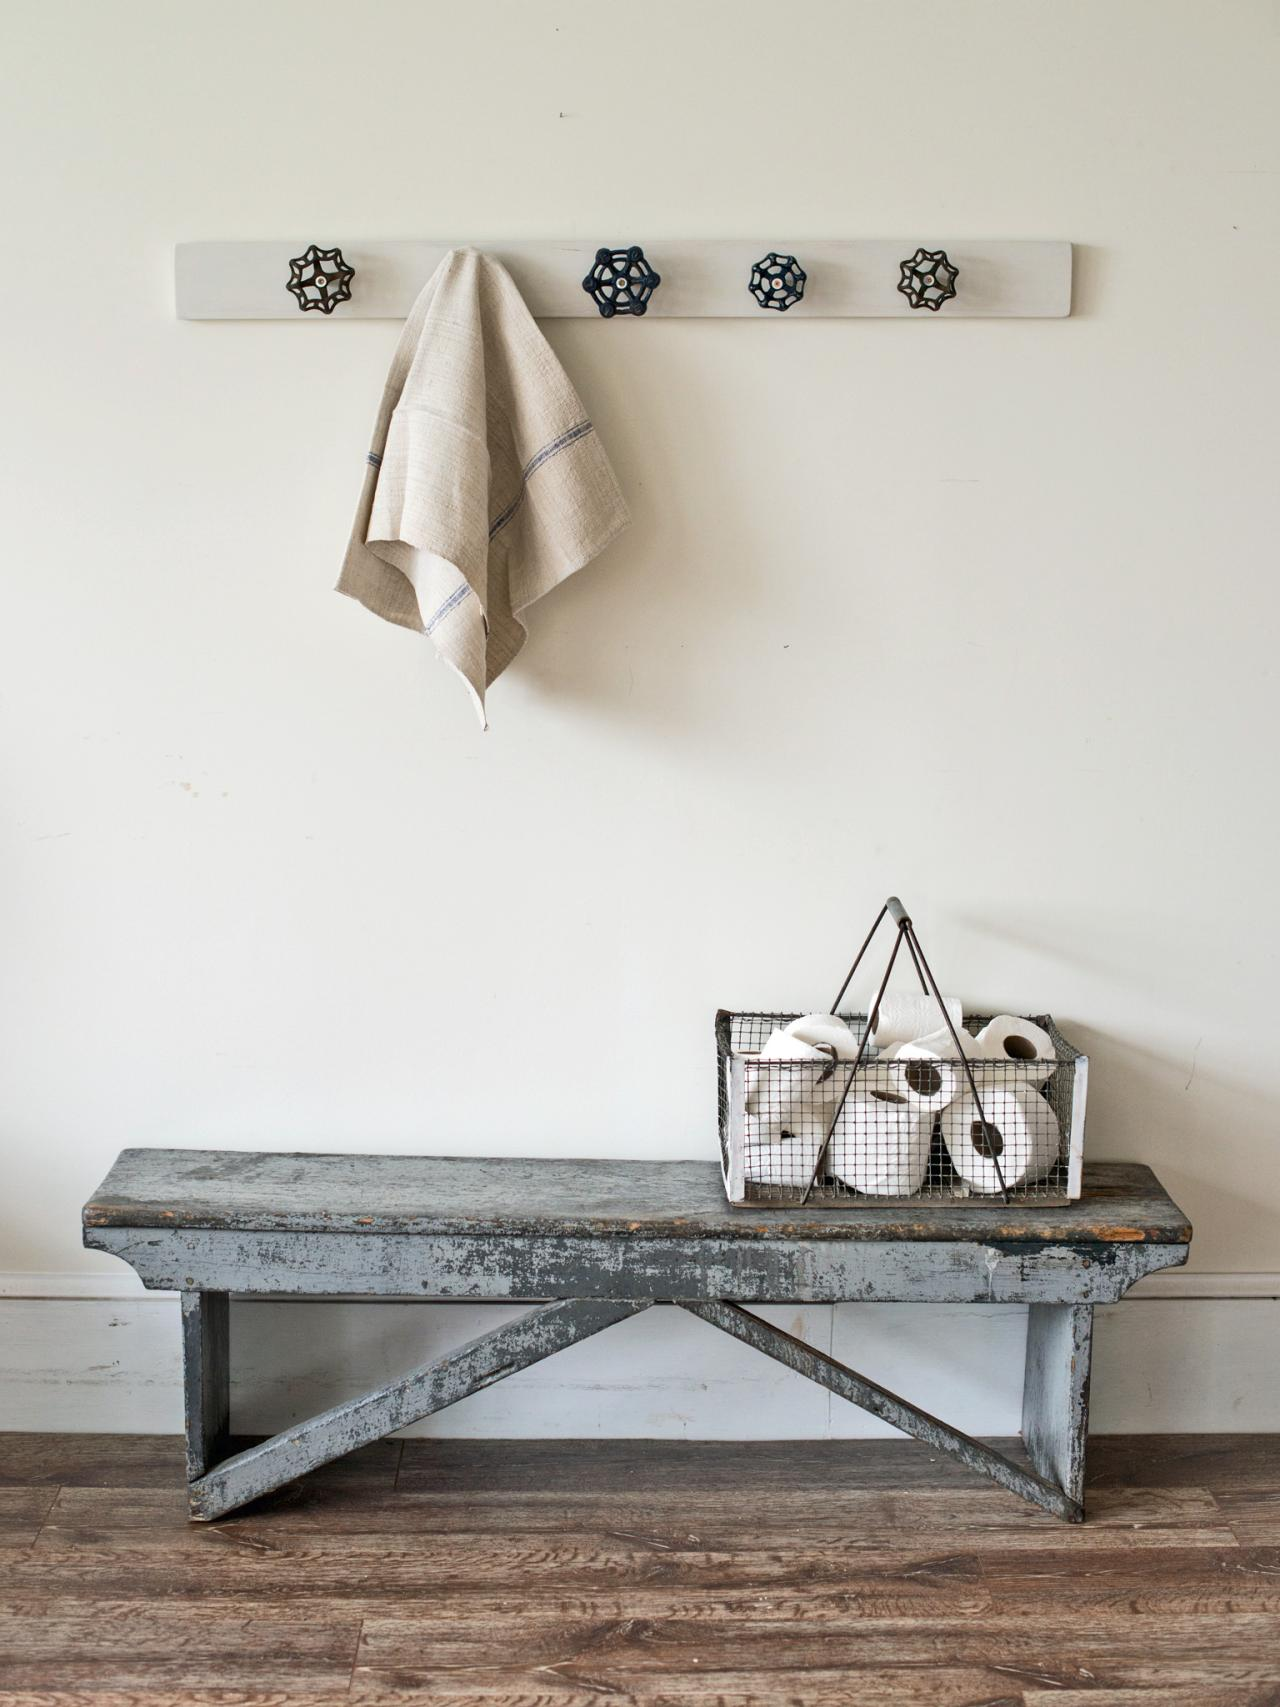 Upcycle Vintage Spigot Handles Into a Trendy Towel Rack | HGTV